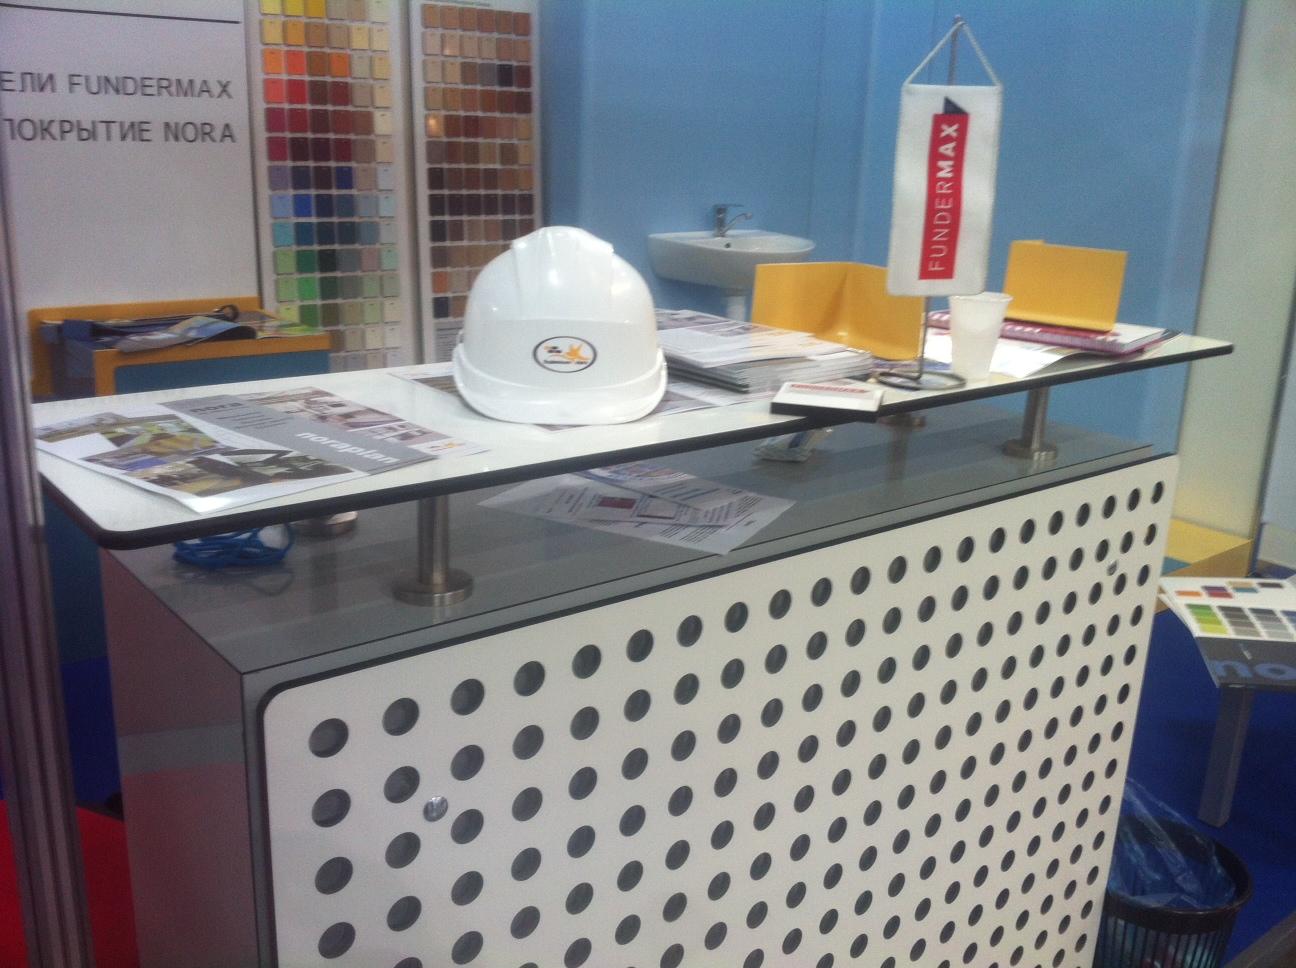 Fundermax выставка LabCoplex 2012